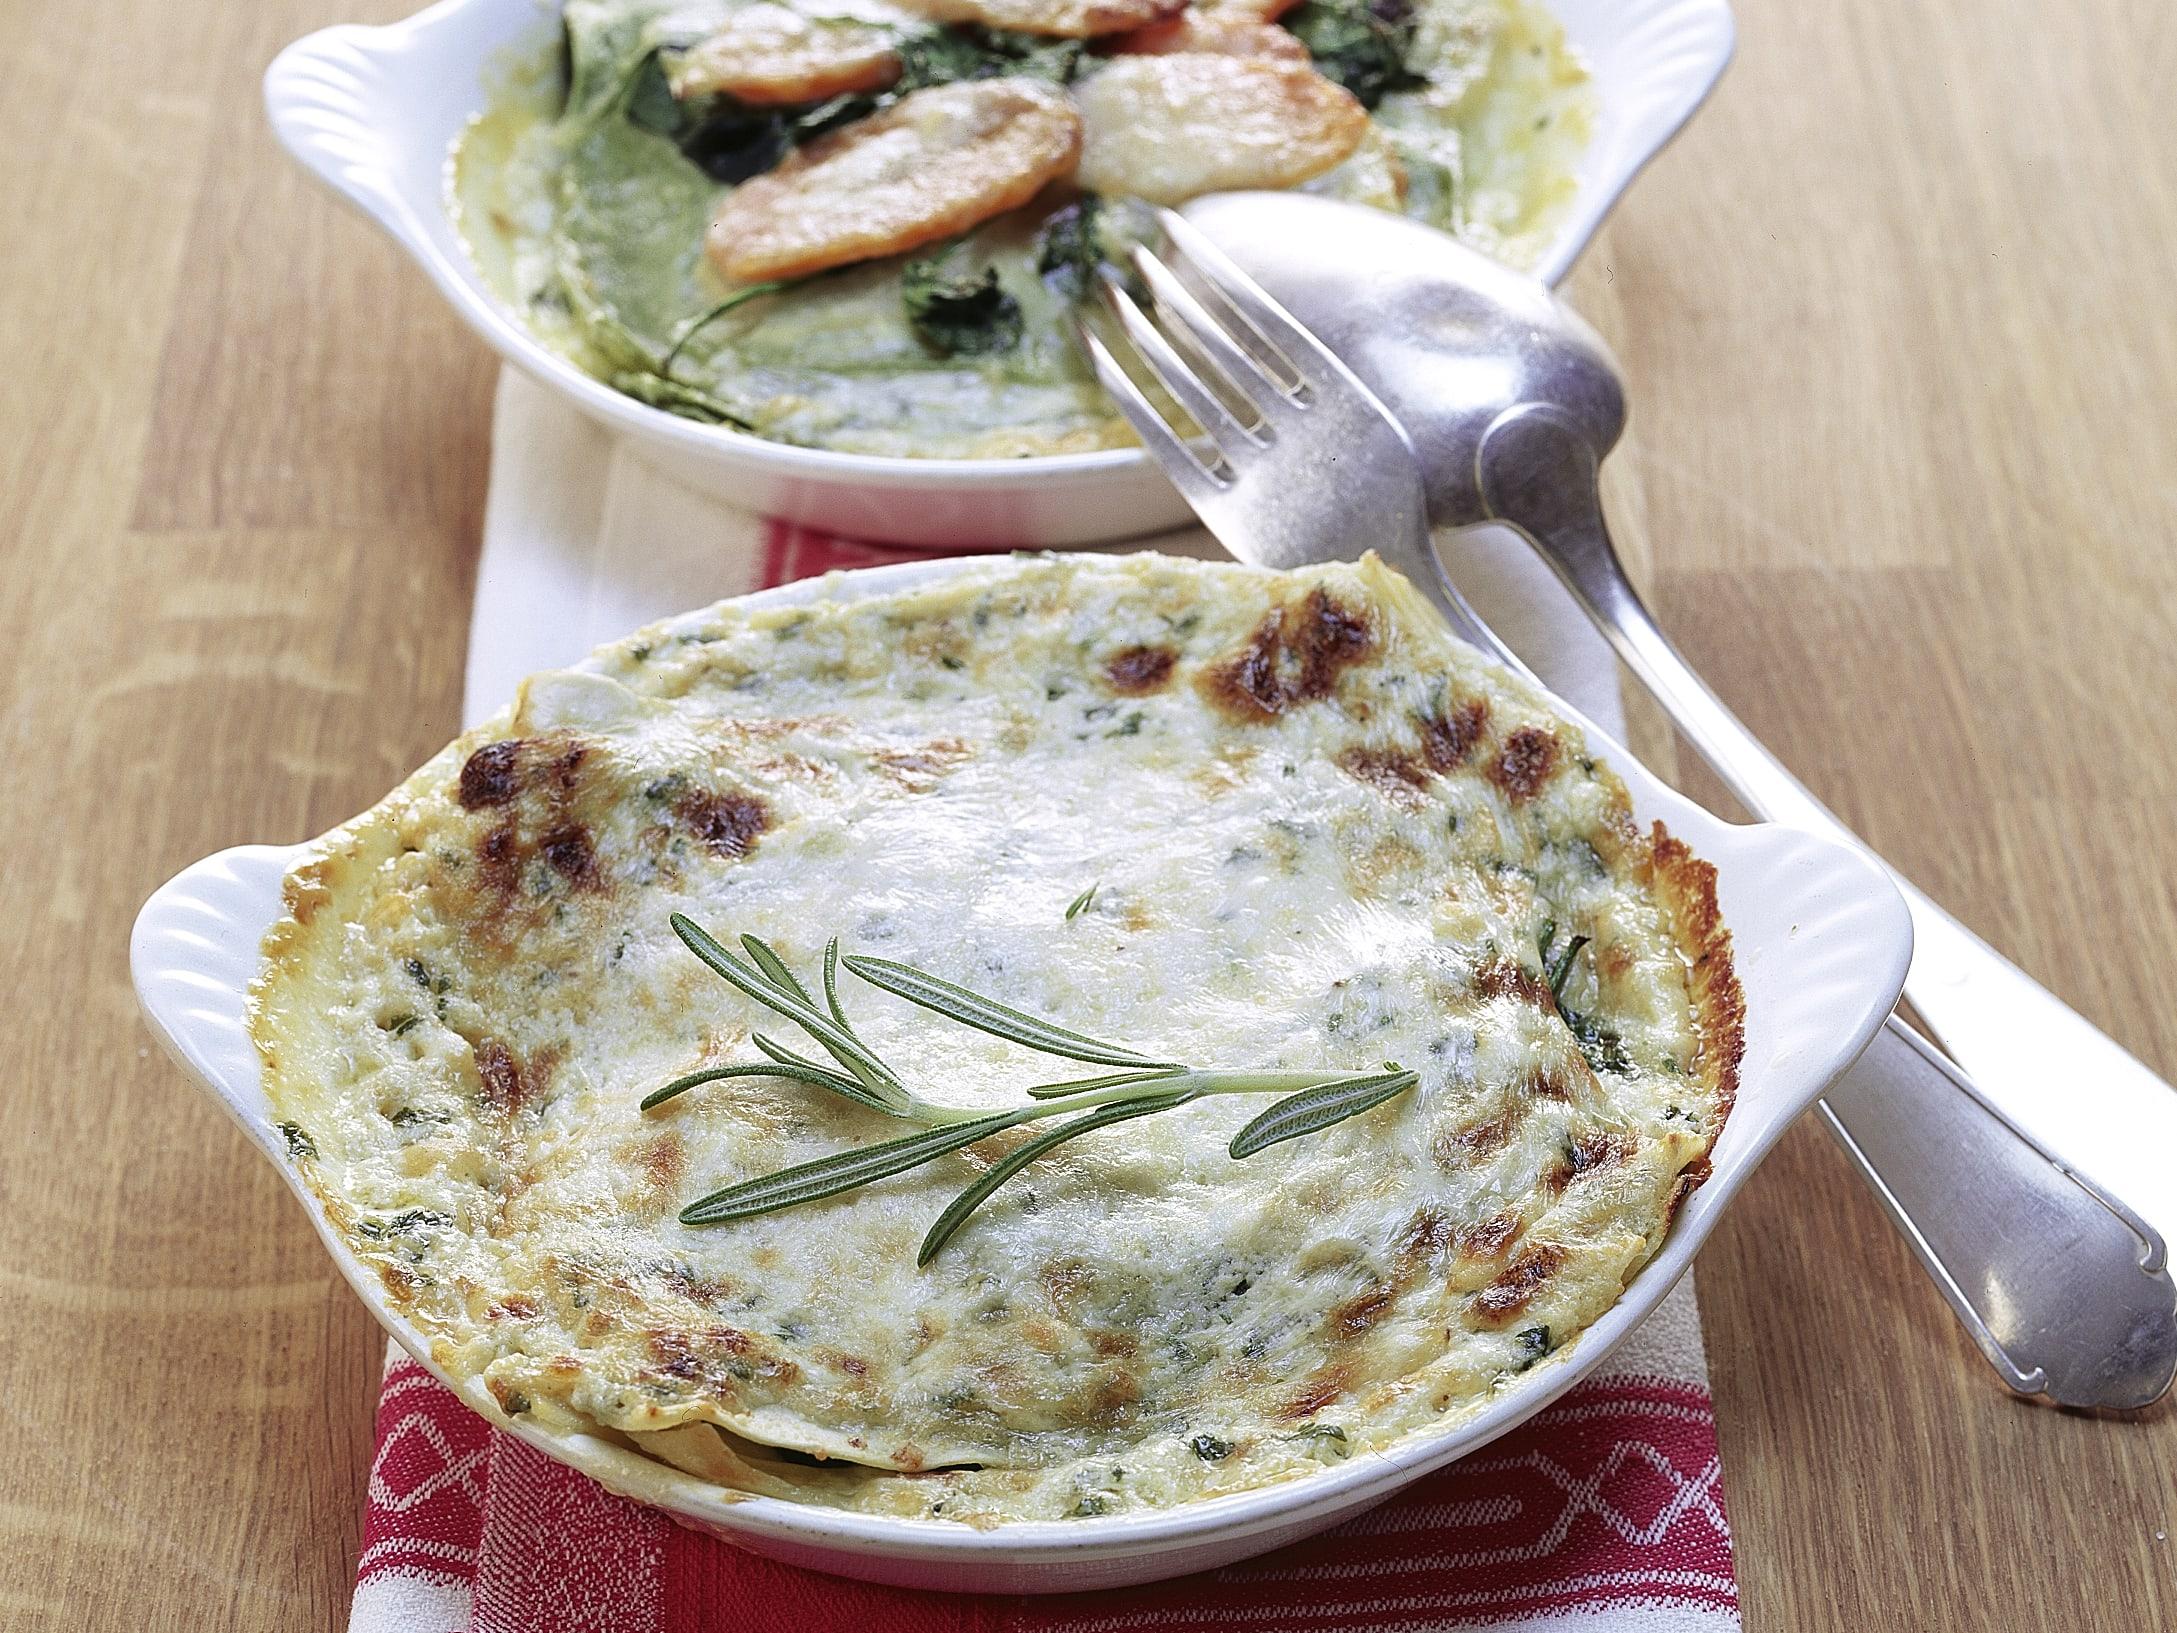 Gemüselasagne mit Bärlauch-Käsesauce